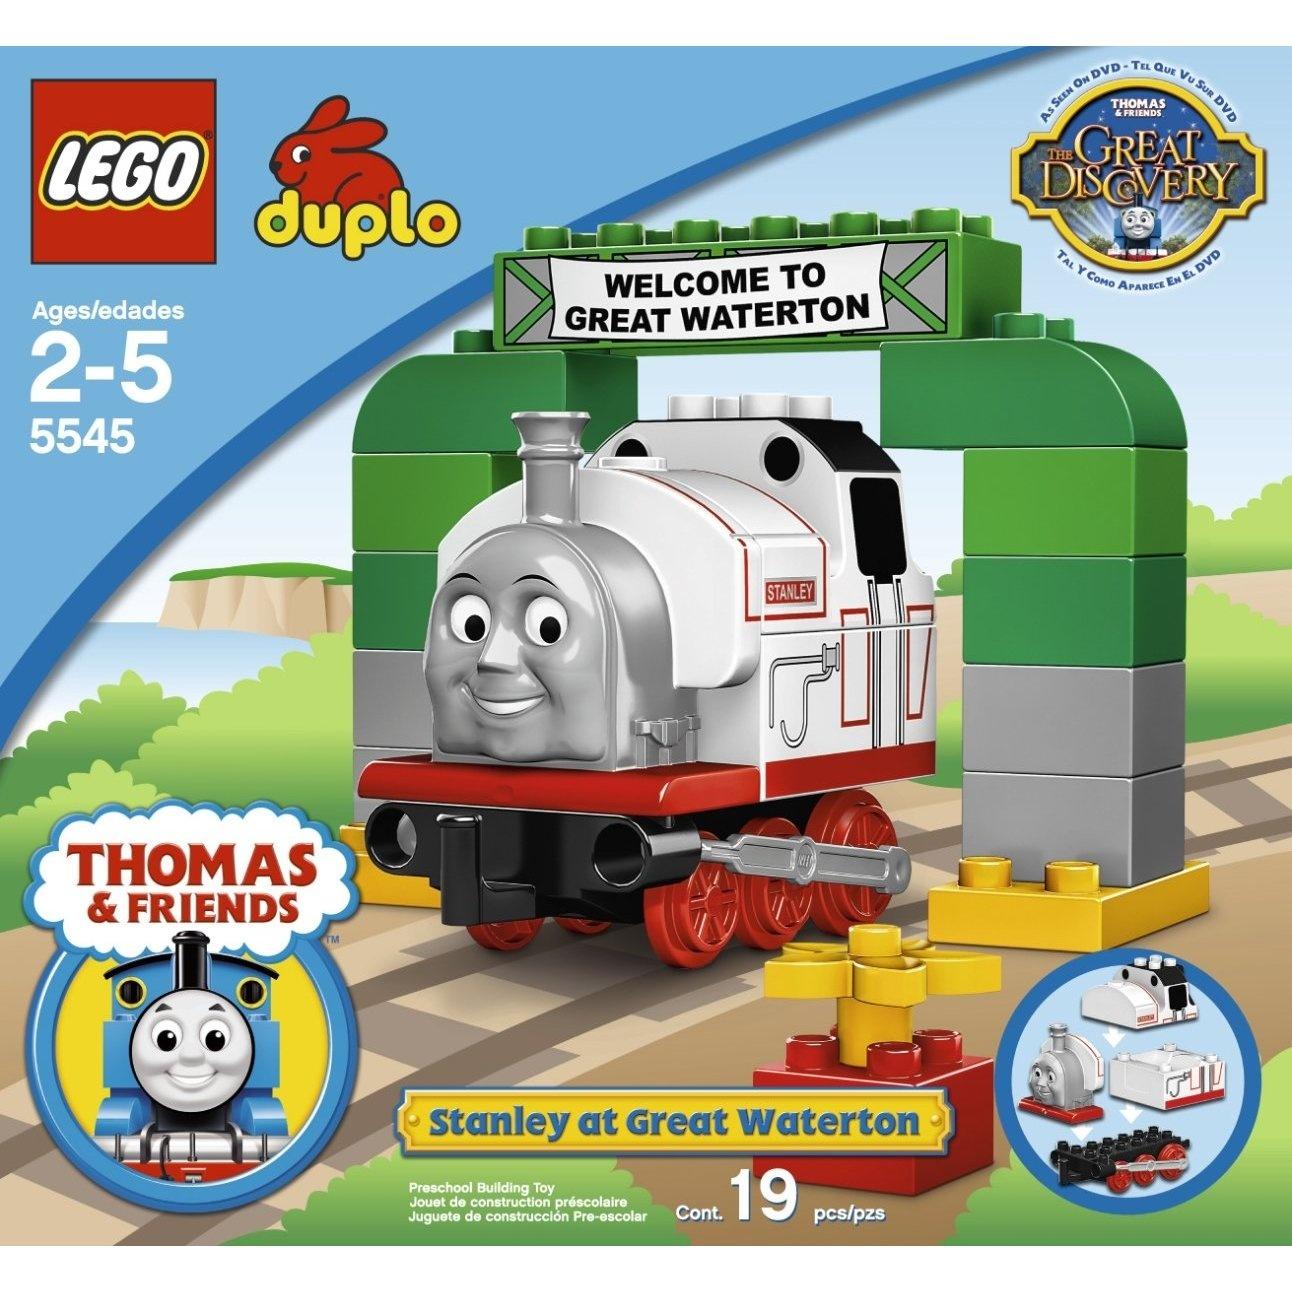 Dvd Lego Buy Online From 5547 Duplo James Celebrates Sodor Day